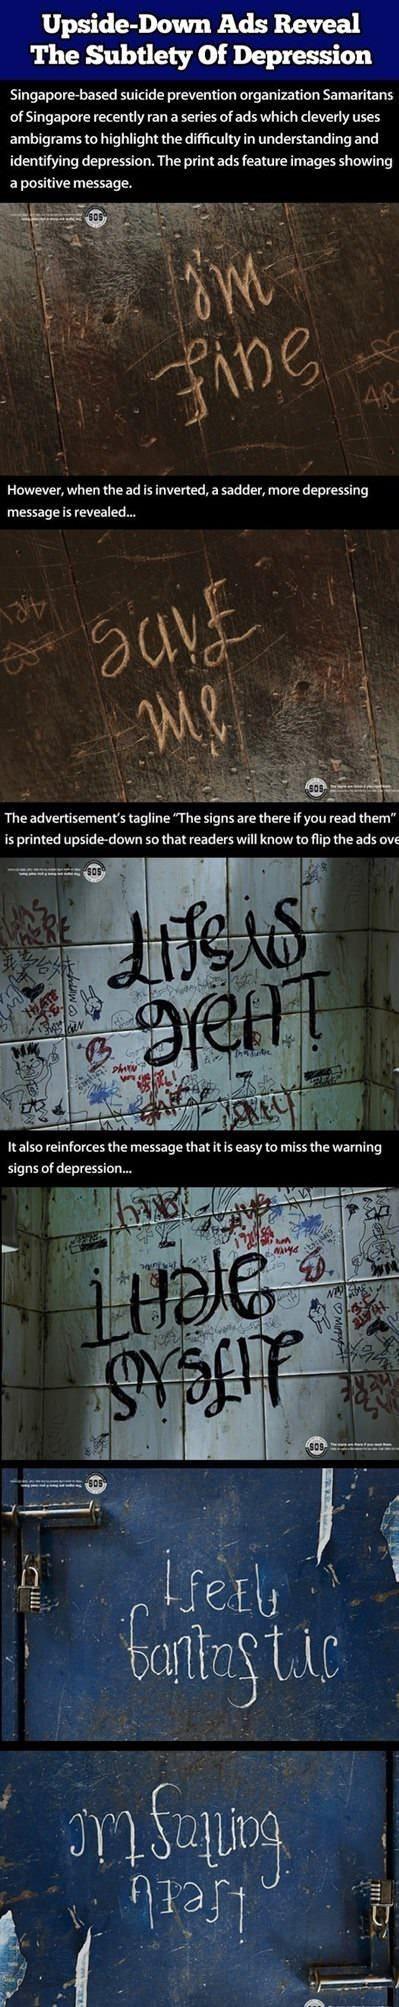 The Subtlety of Depression